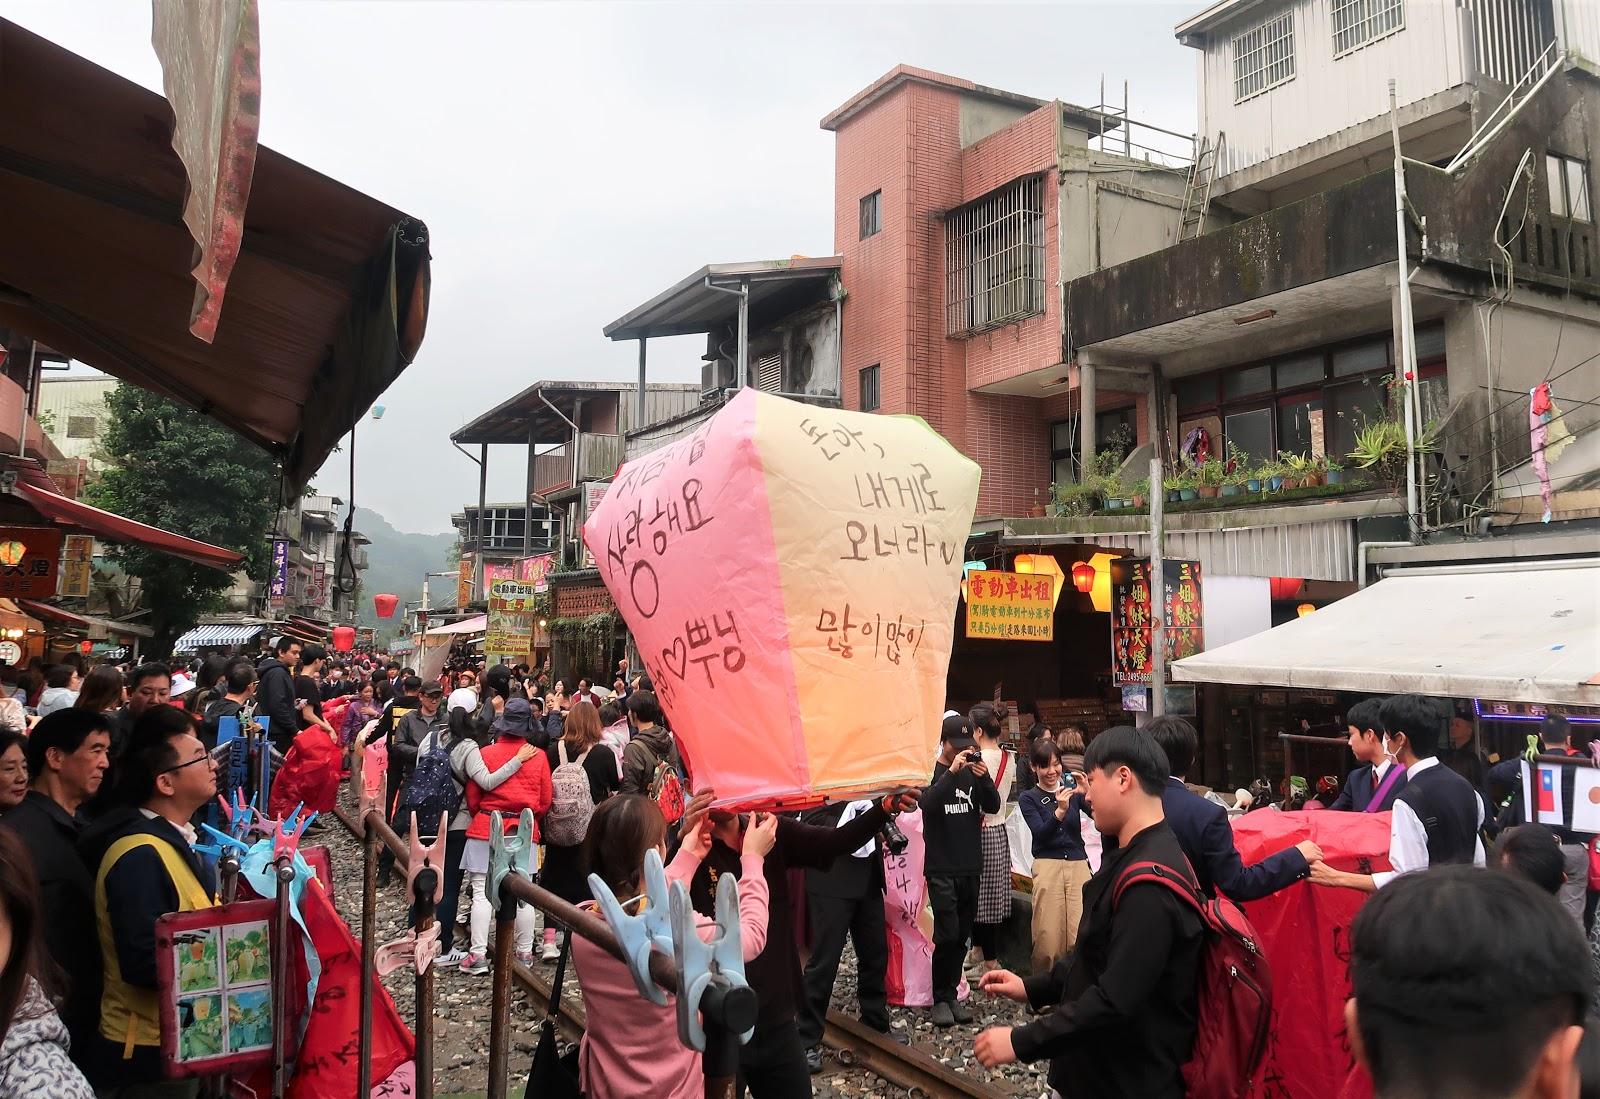 Yehliu Geopark, Jiufen Tour, and Releasing Sky Lantern in Shifen